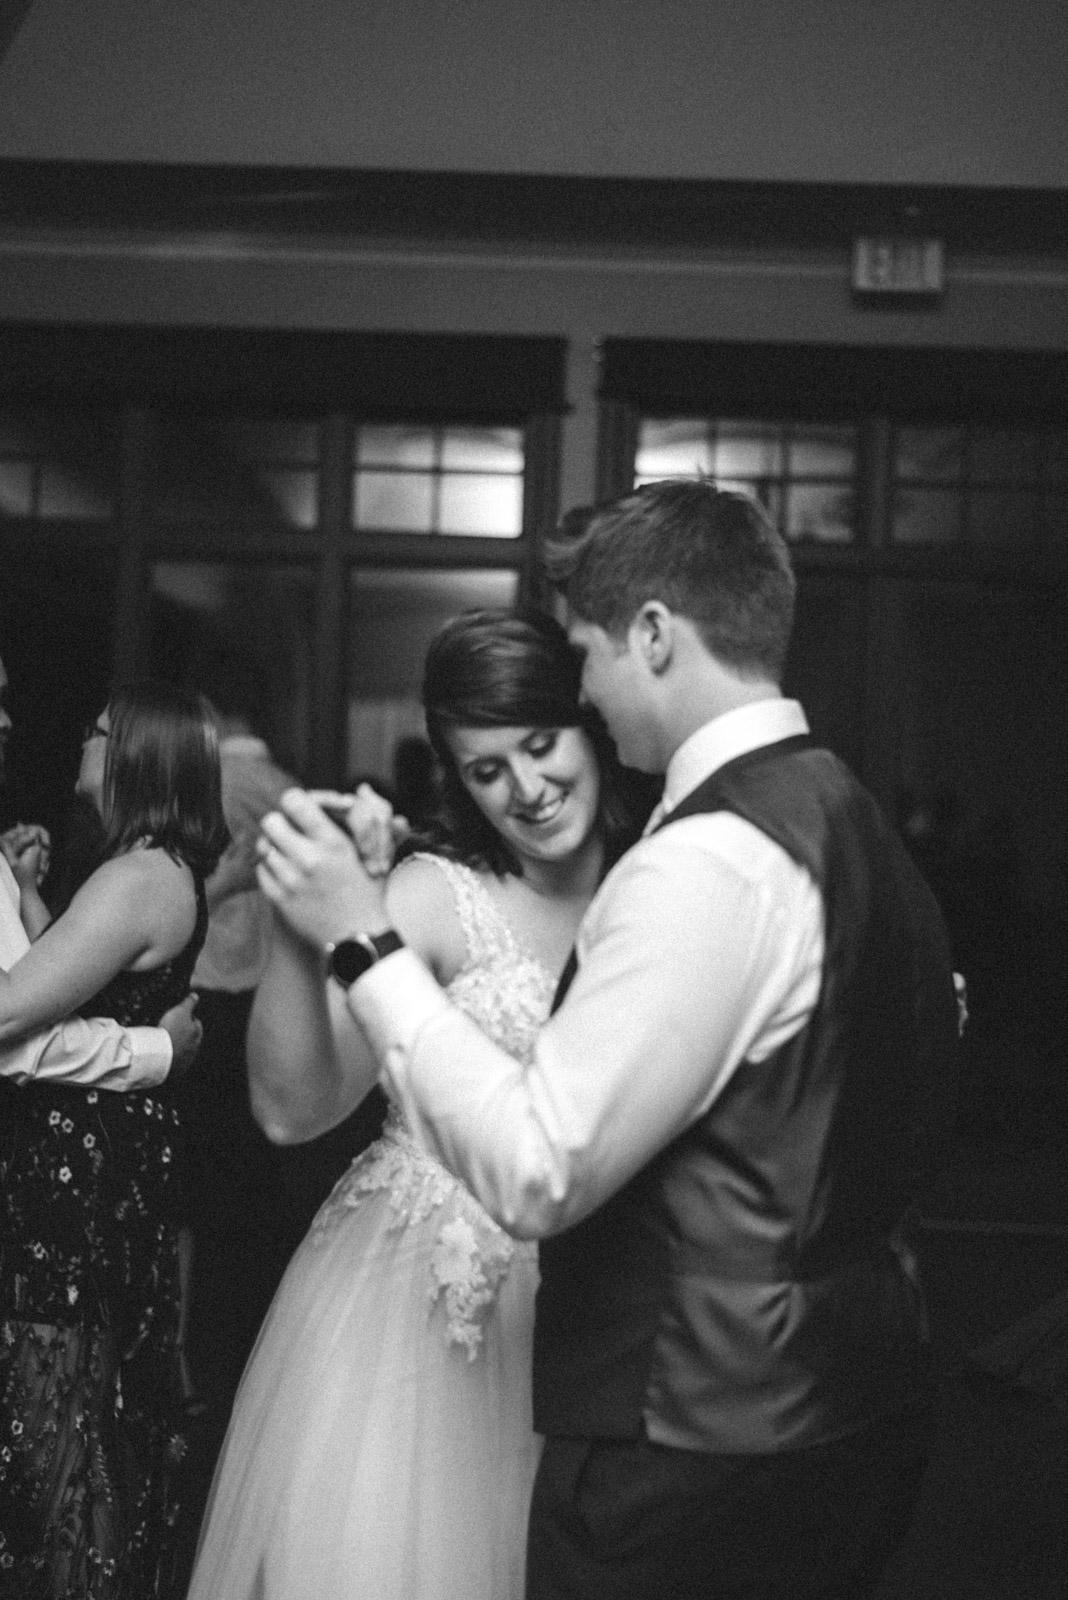 Emerson & Elicia's Golf Course Wedding Aidan & Leanne Hennebry Hamilton Wedding Videographers Photographers Niagara Hush Hush Photography & Film-69.jpg